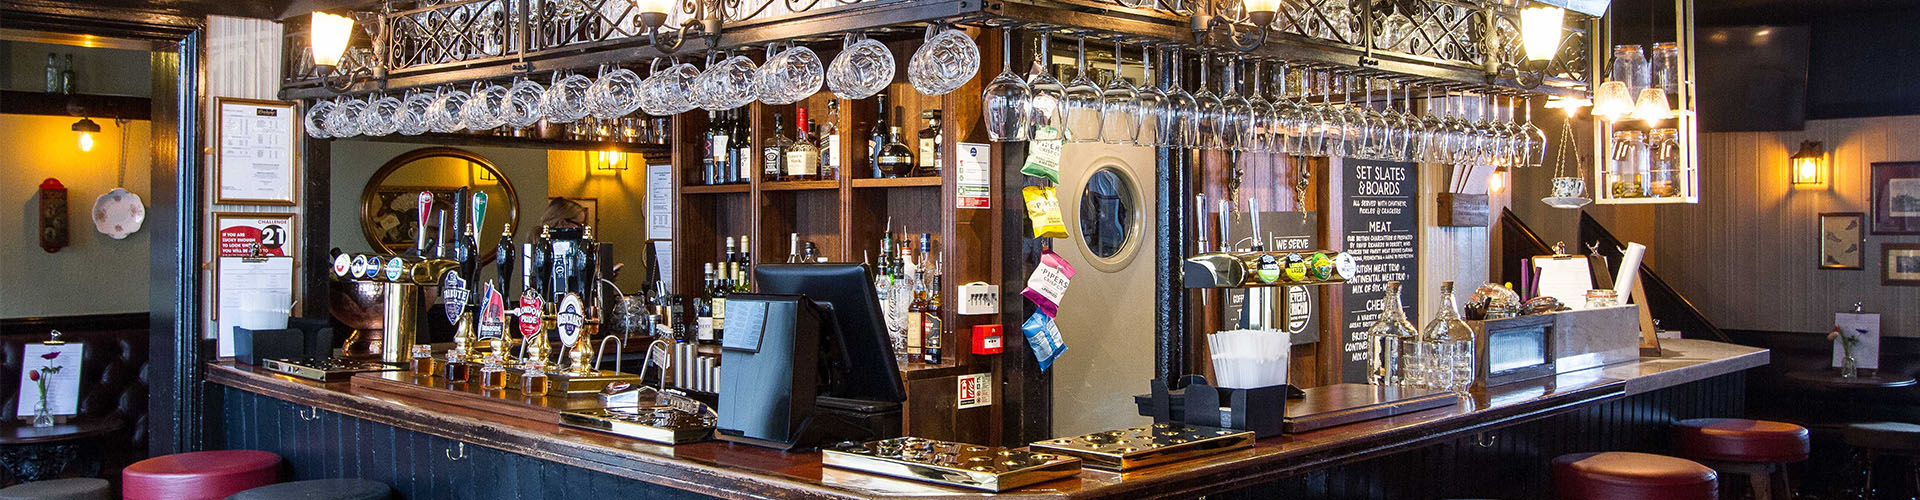 2020 - City Taverns - Uxbridge Arms